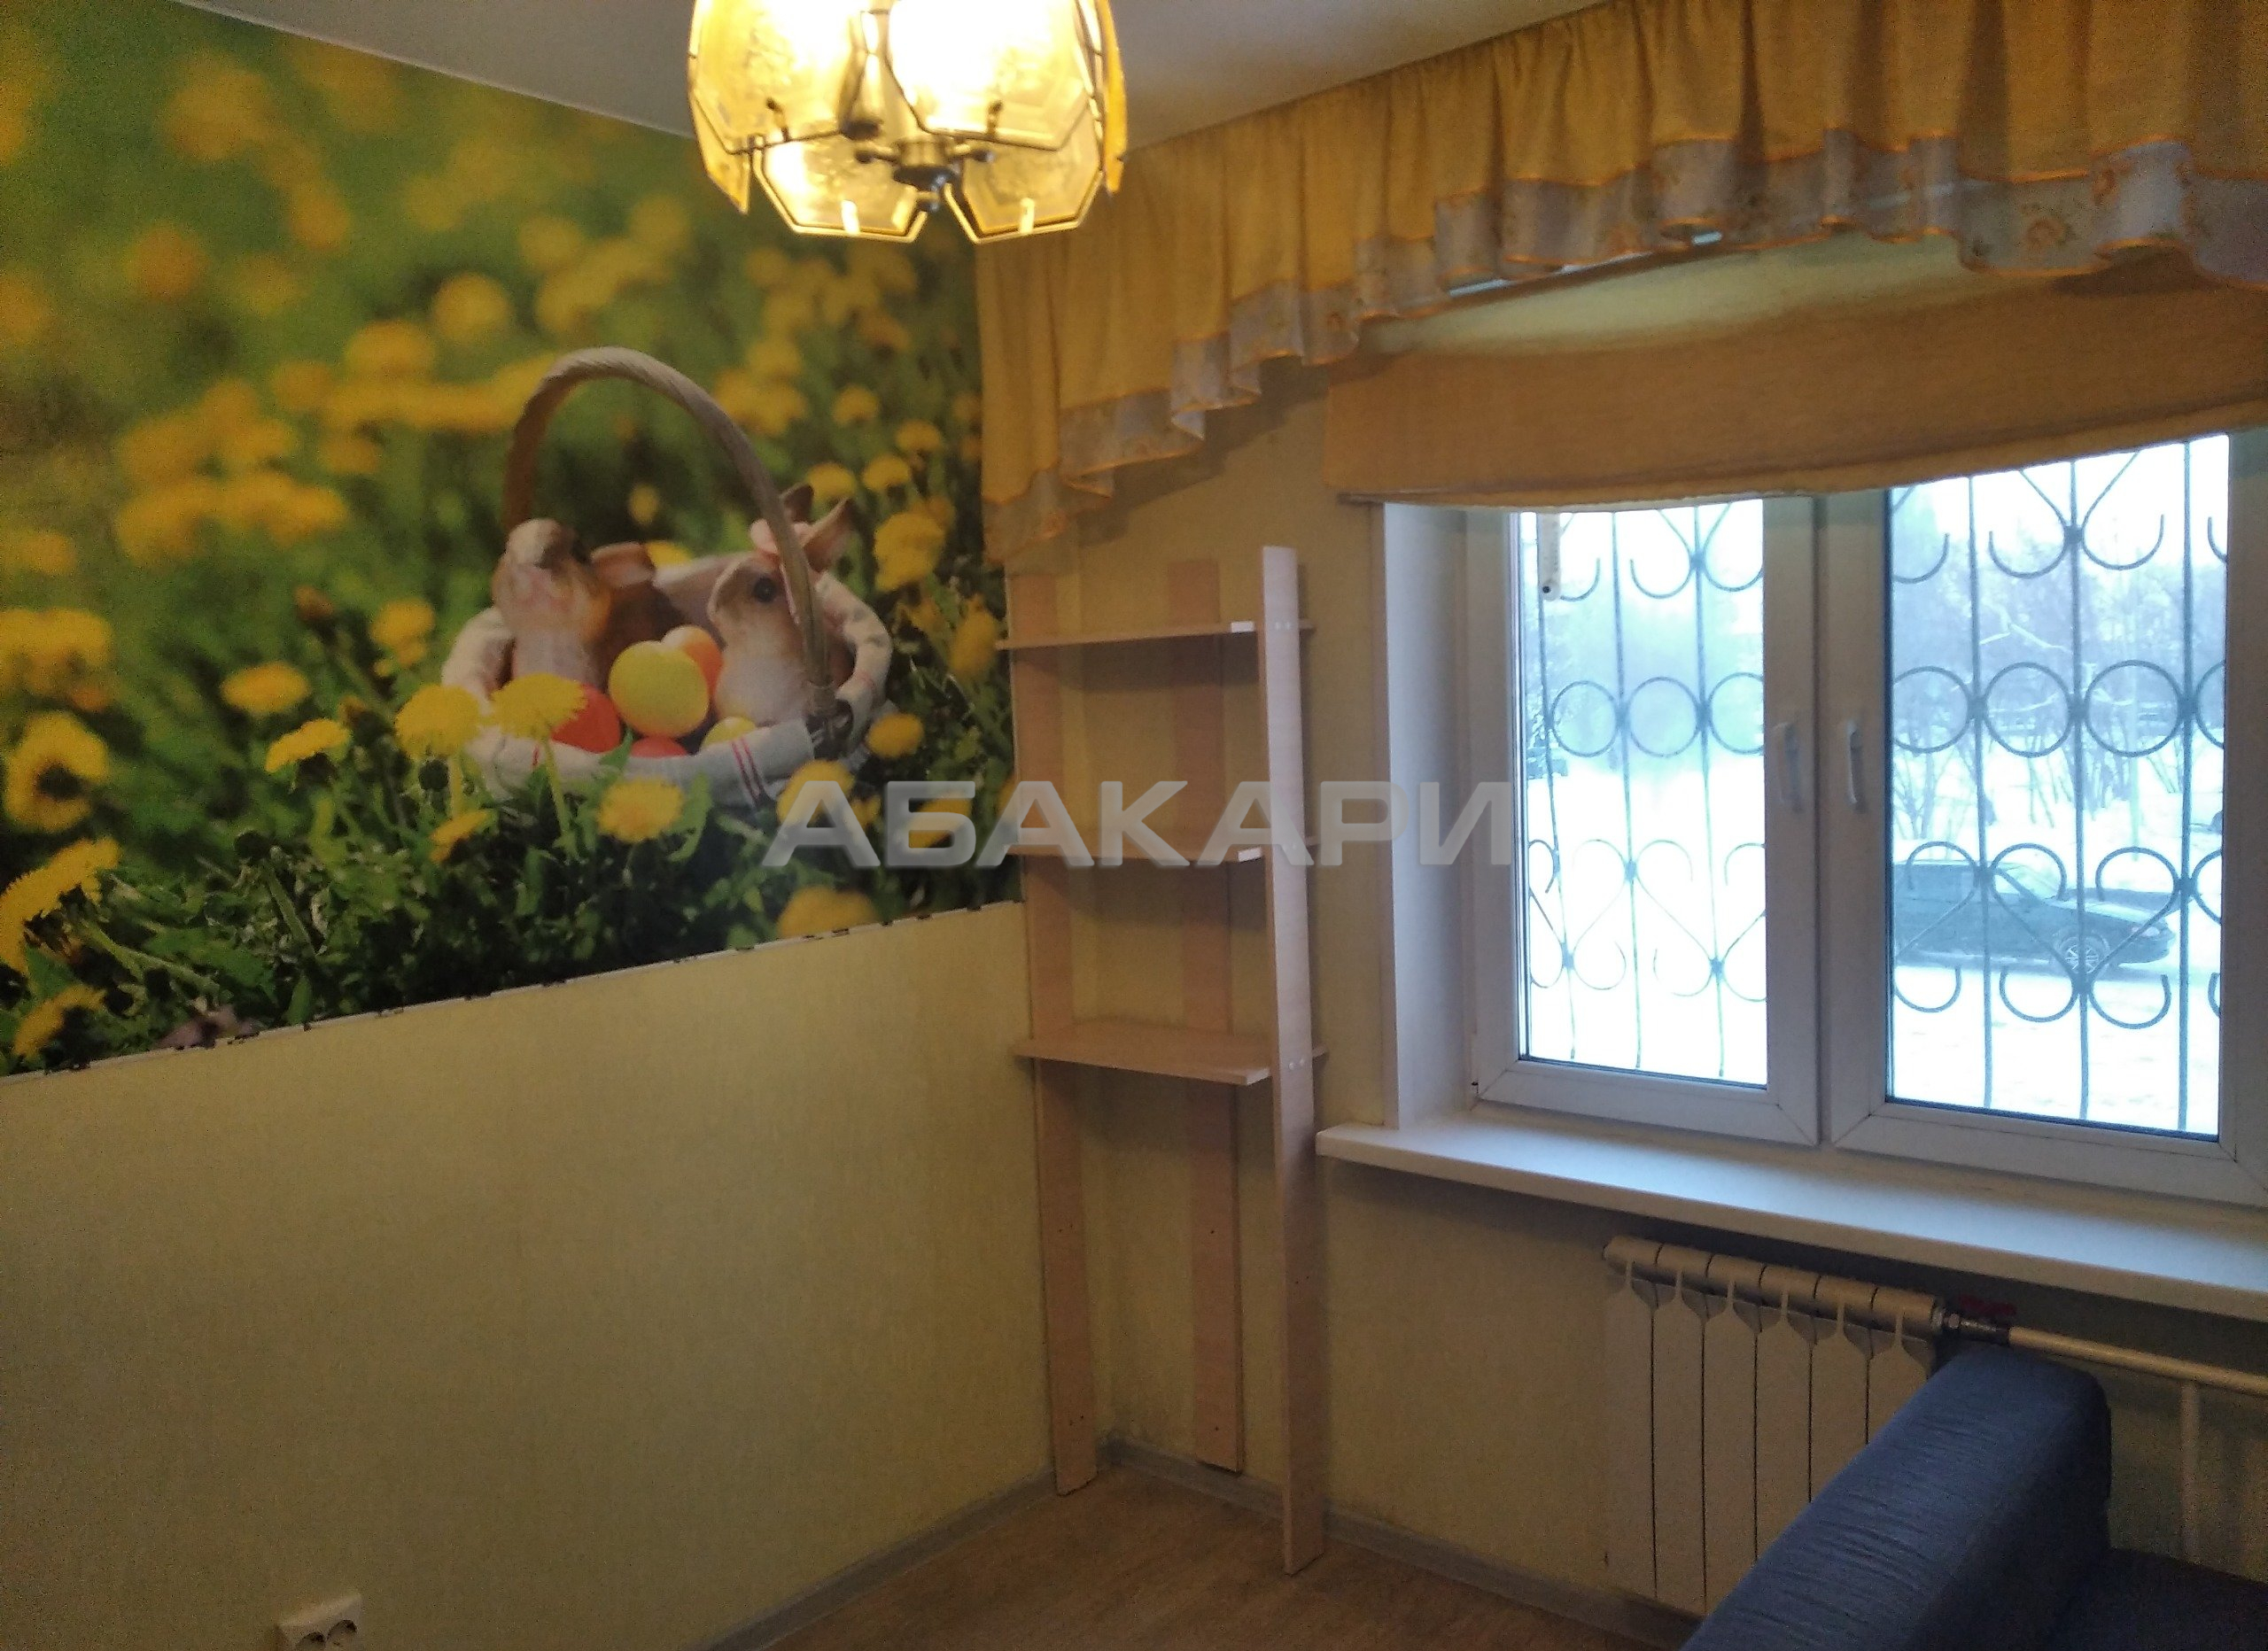 4к квартира ул Говорова, д 56 1/5 - 60кв | 23000 | аренда в Красноярске фото 3